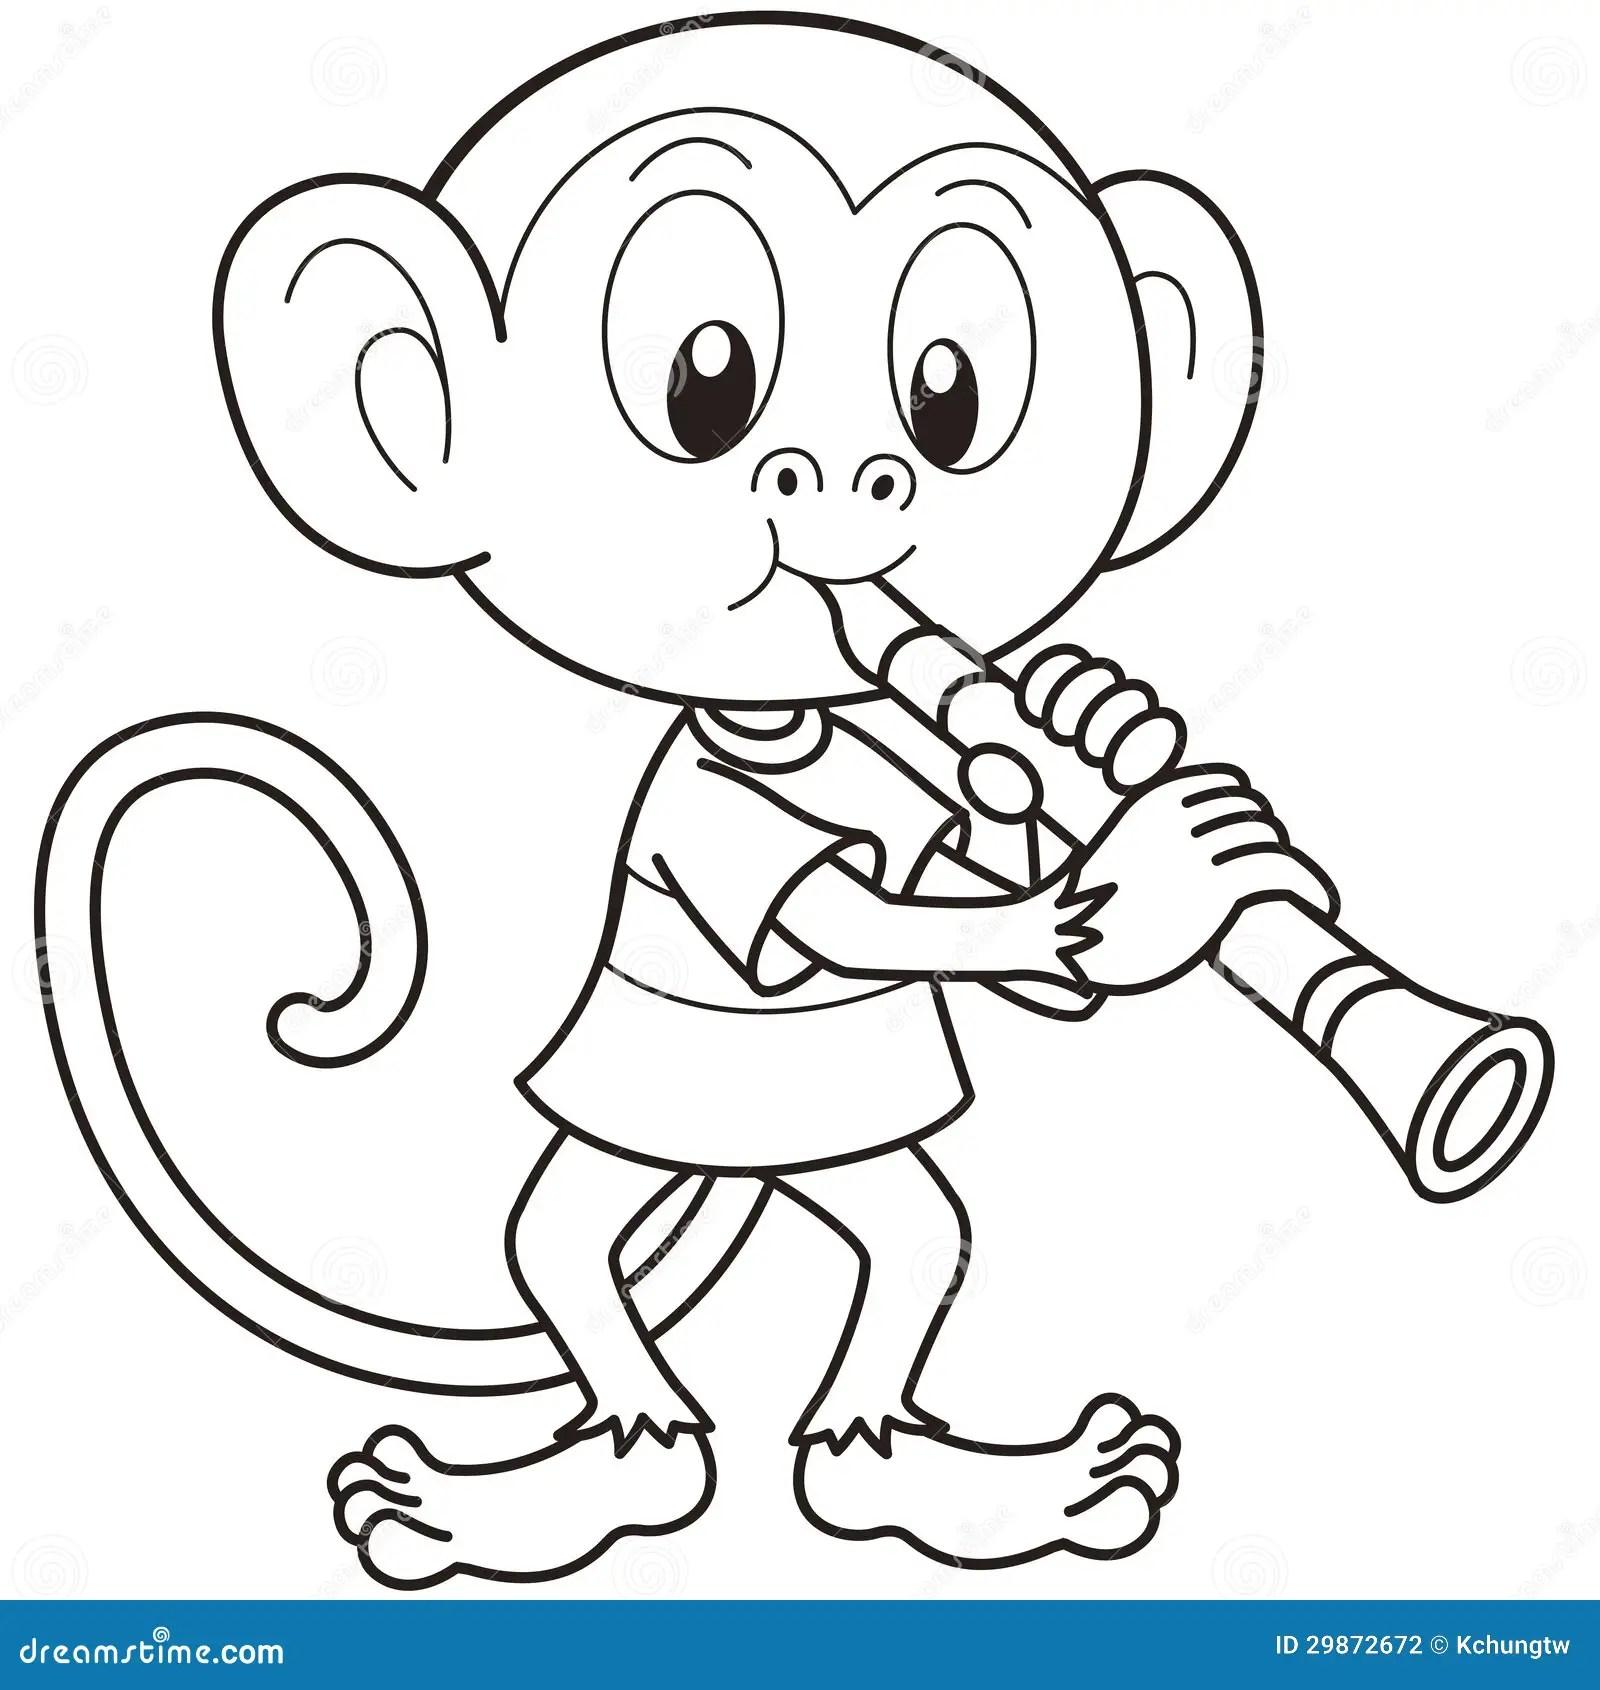 Cartoon Monkey Playing A Clarinet Stock Vector